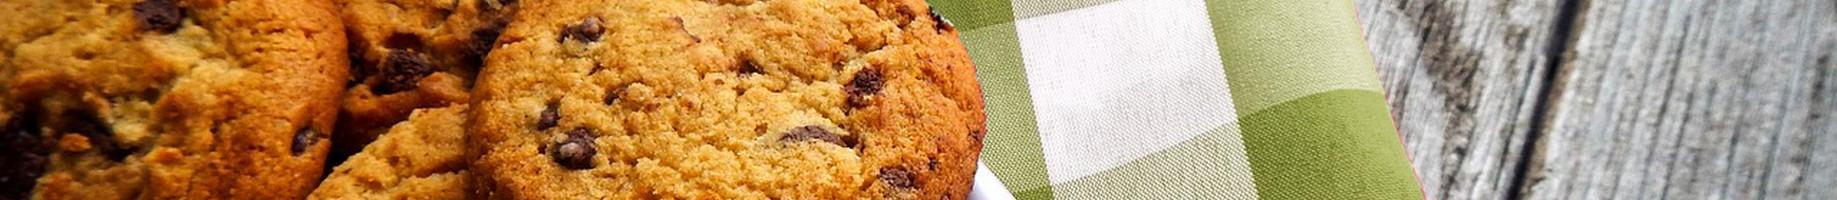 cookies-2760773_1280